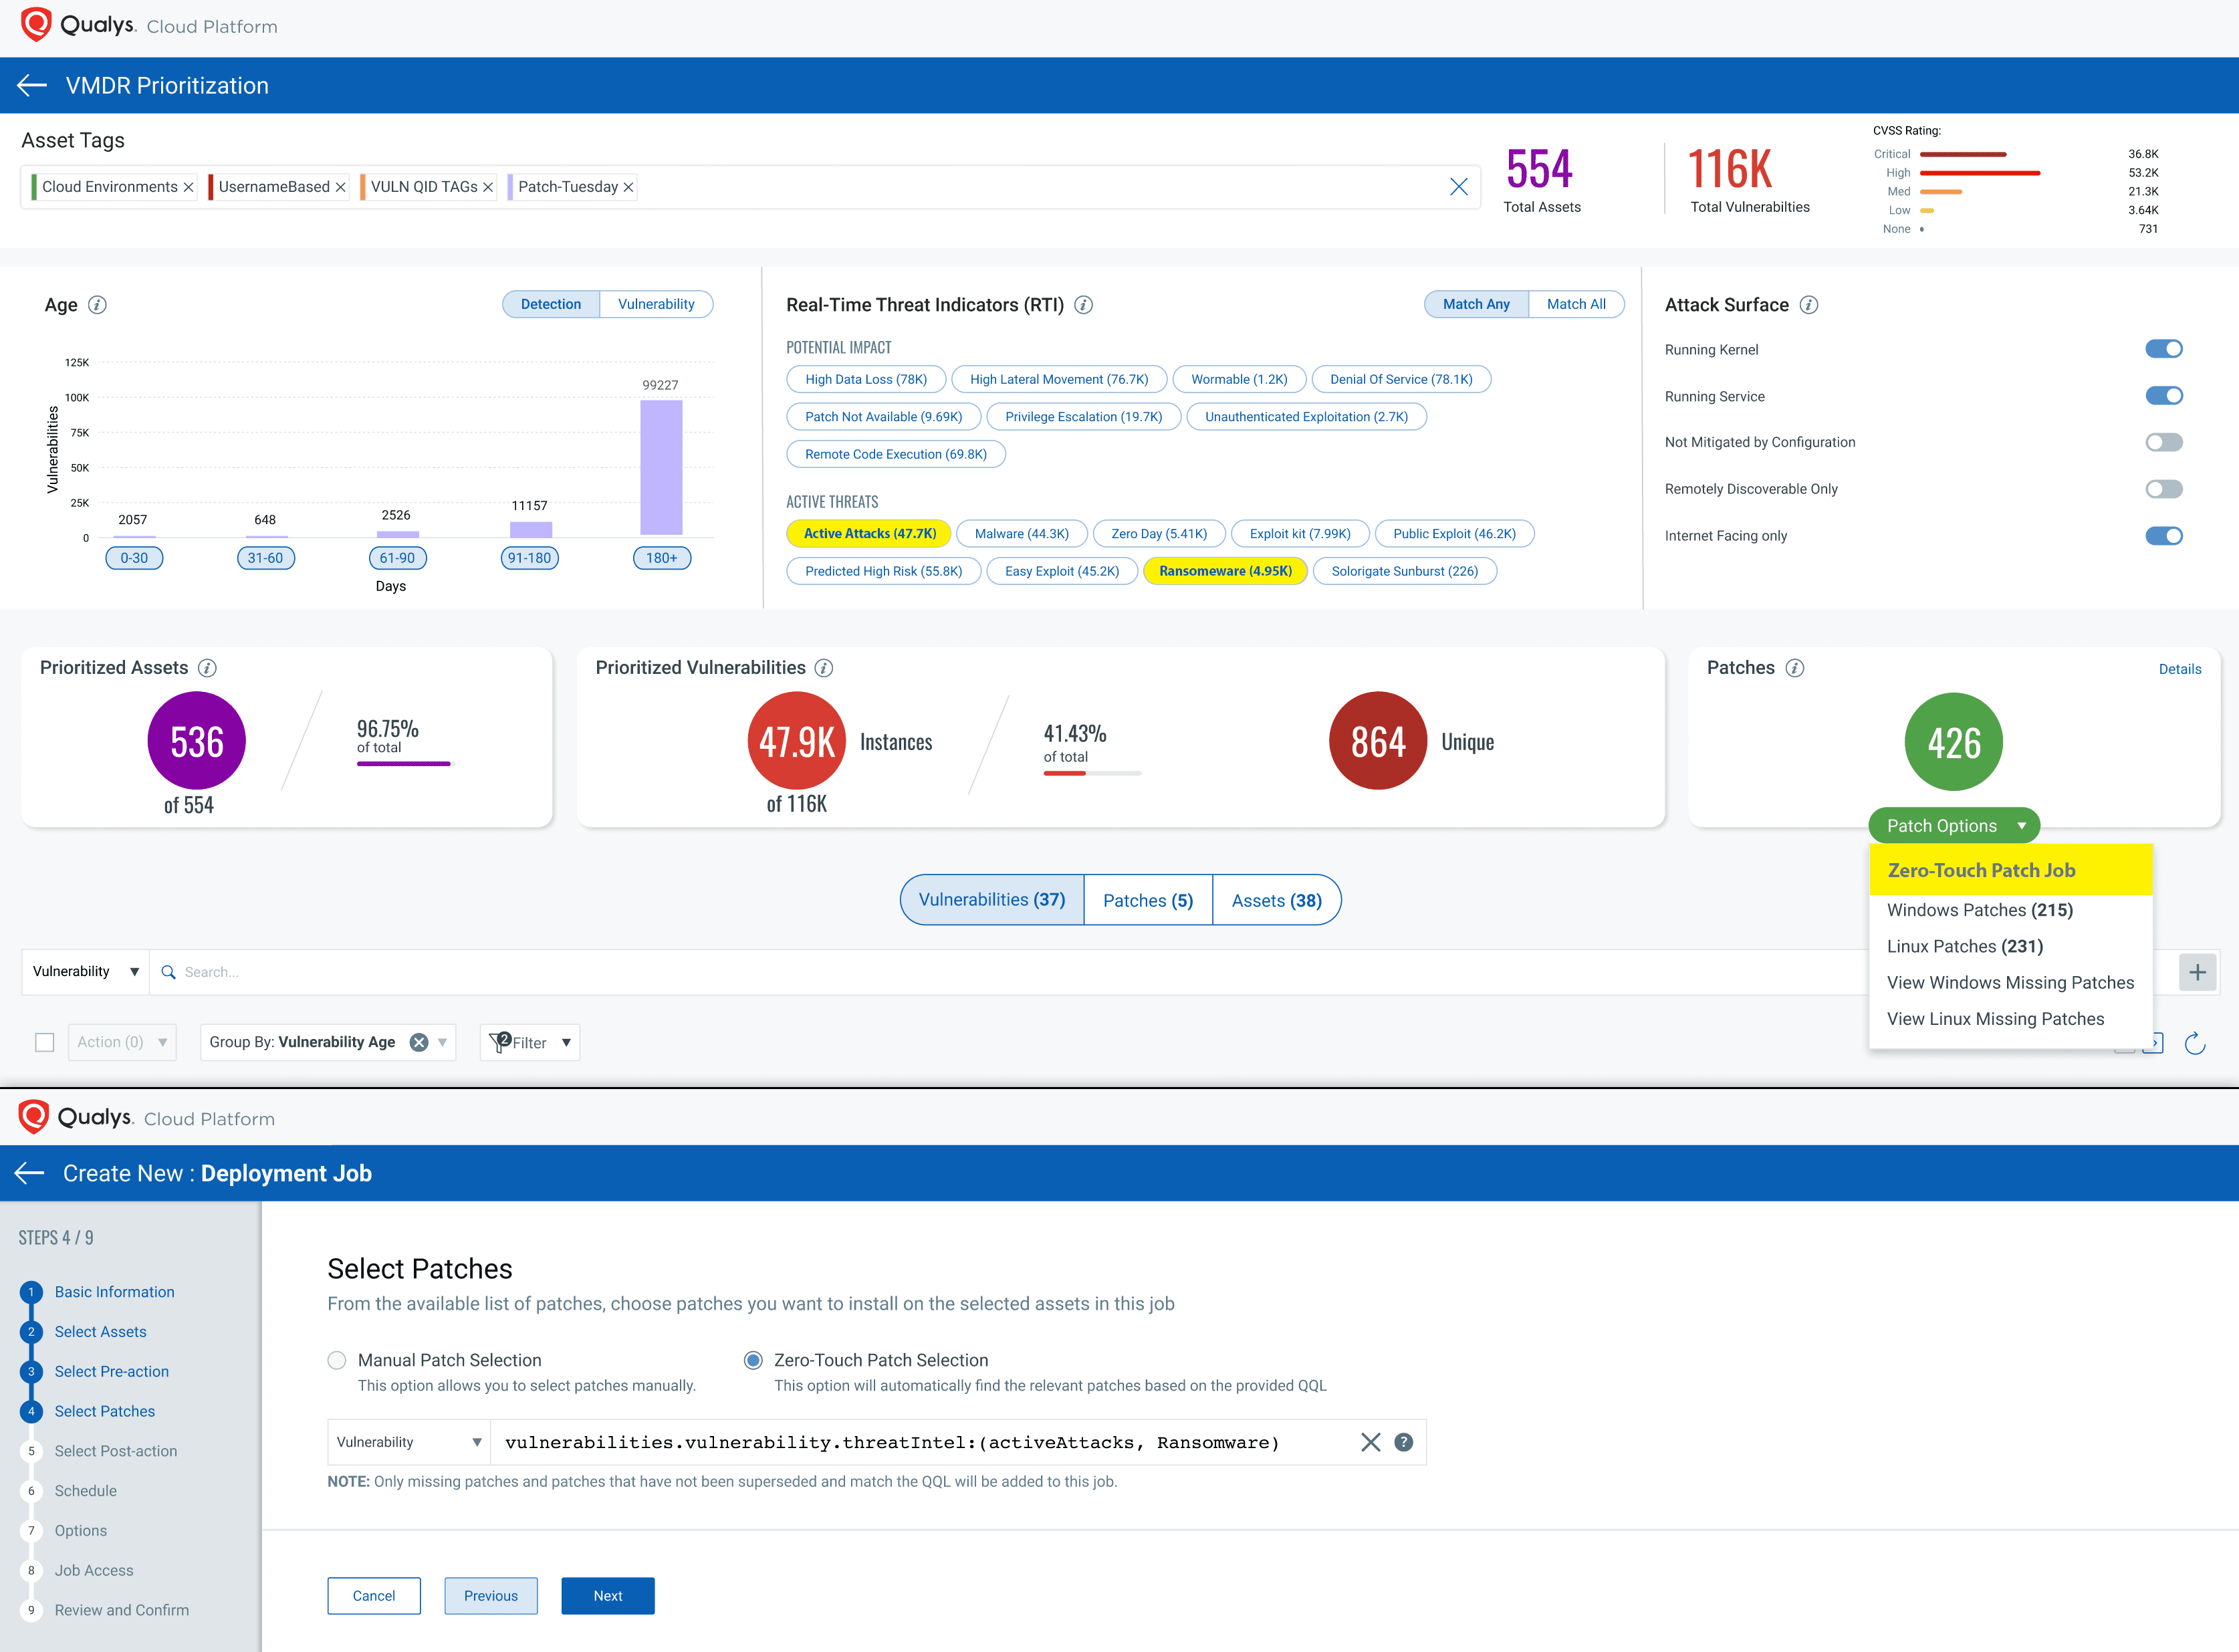 Zero-Touch patch job